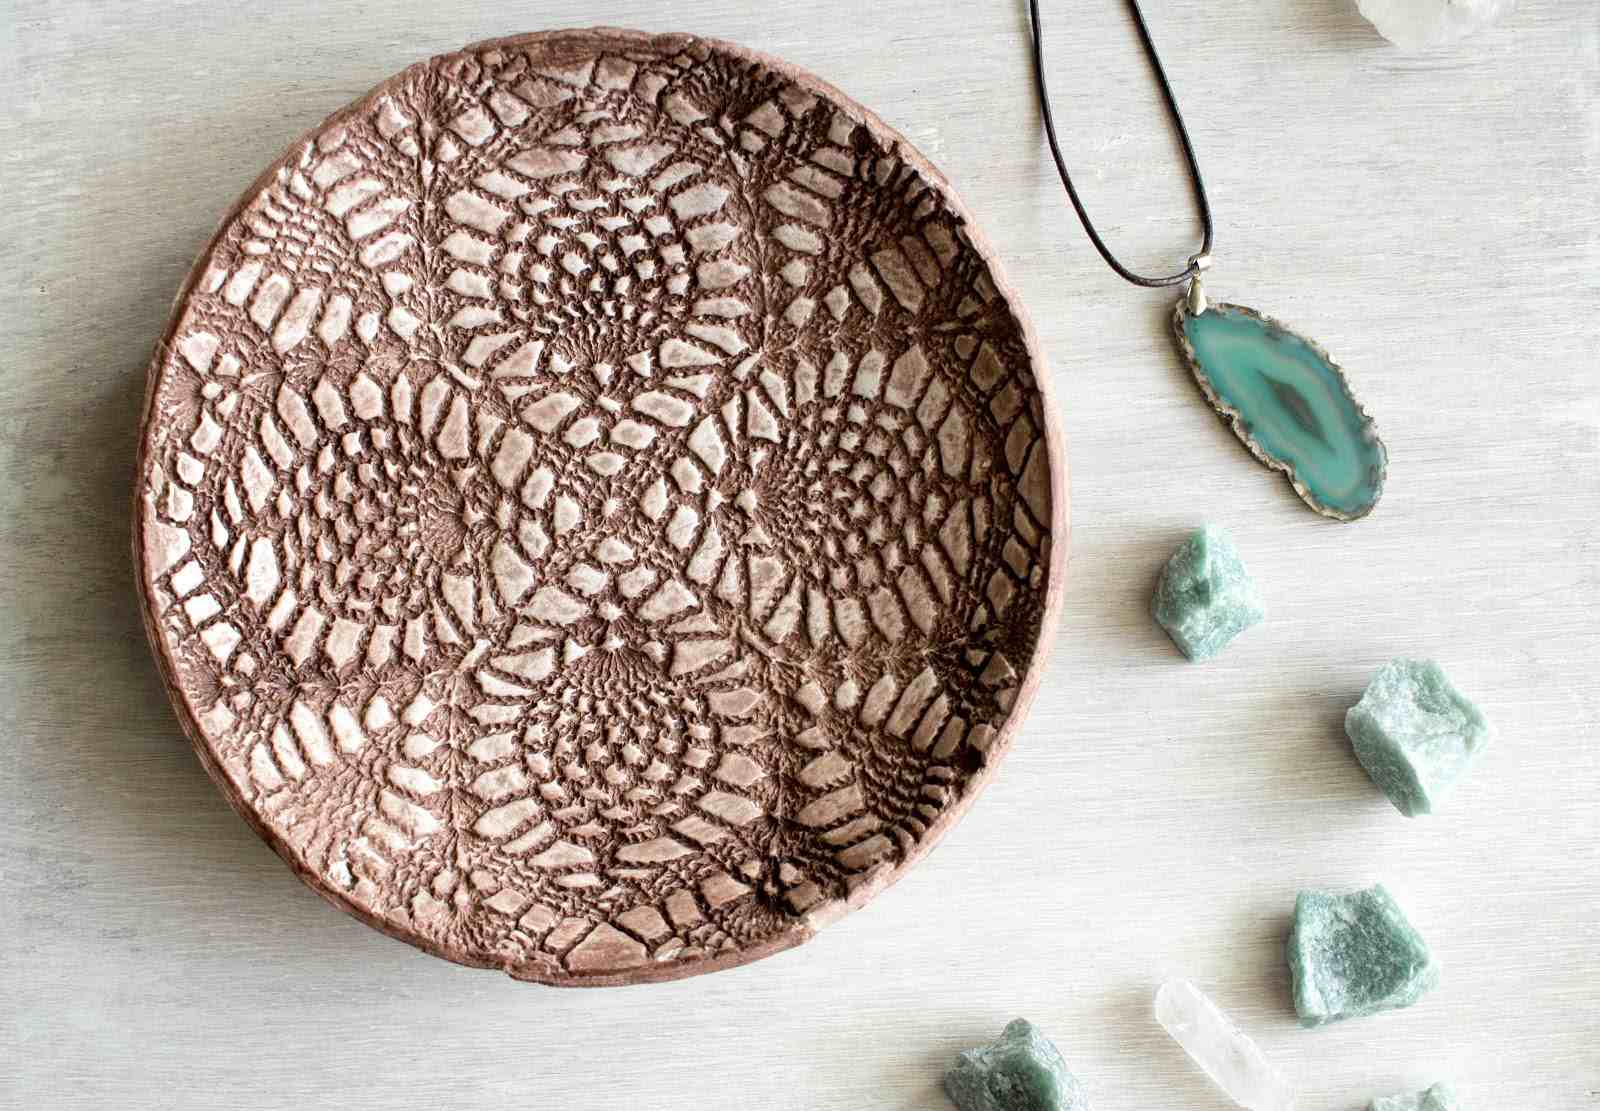 3 Pretty Designs of Craft Paper Doilies 15 Creative Doily Craft Ideas